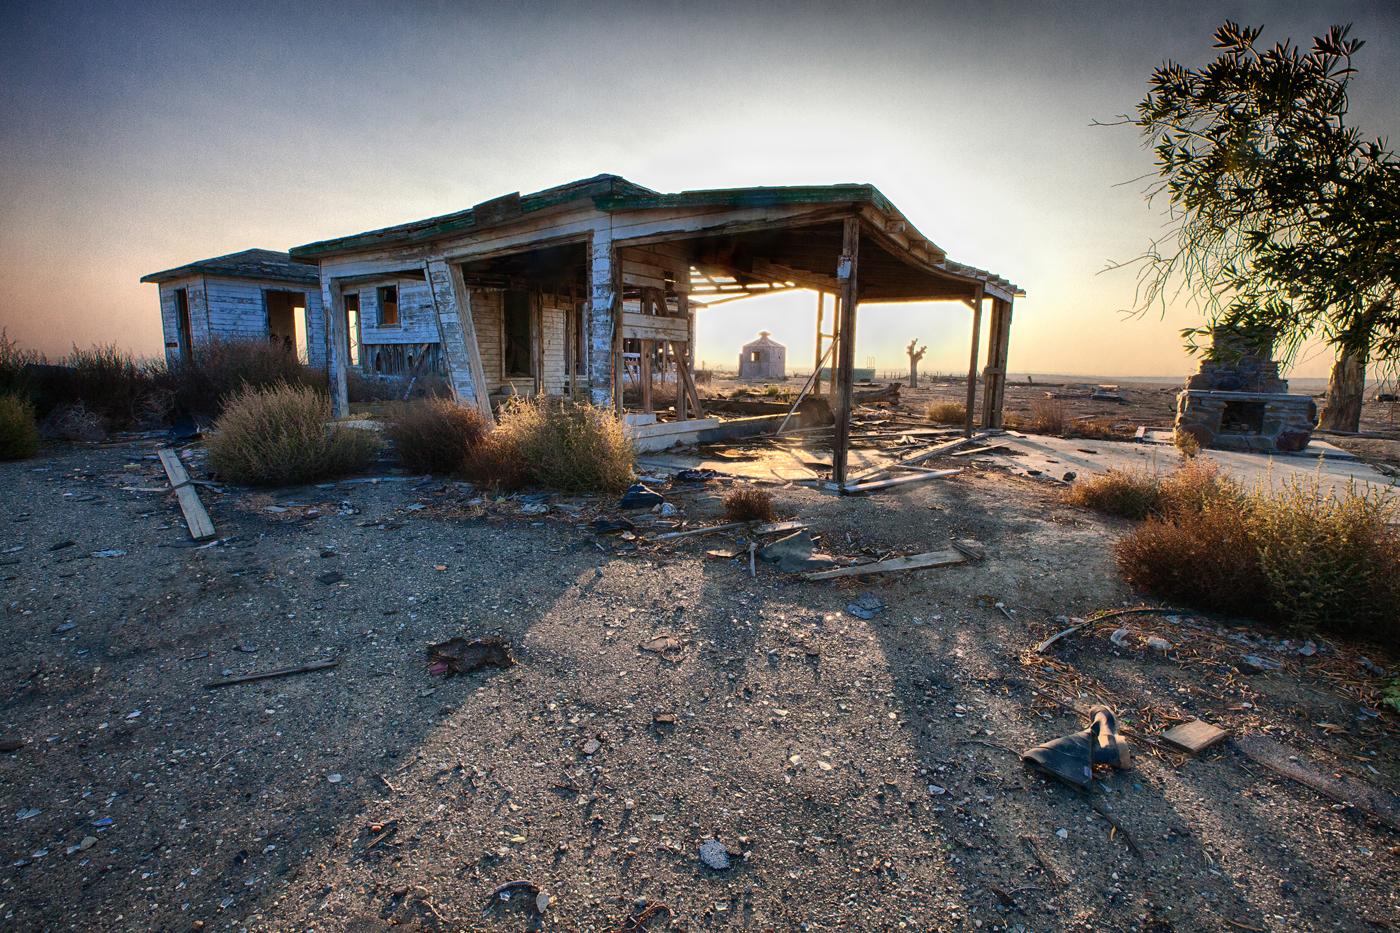 Abandoned in america photographer nyla james explores for Abandoned neighborhoods in america